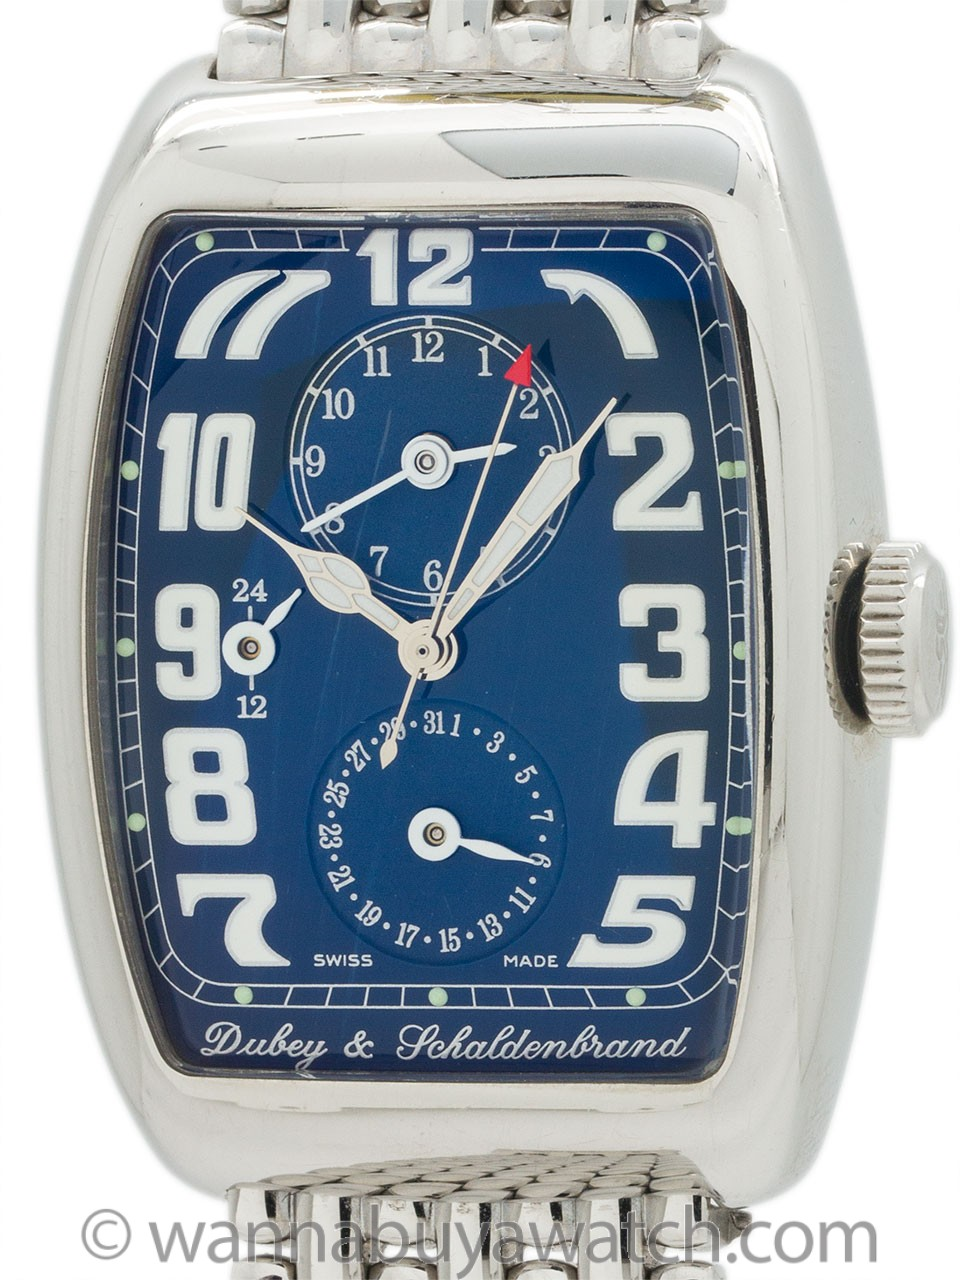 Dubey & Schaldenbrand AeroDyn Duo on Bracelet circa 2000s